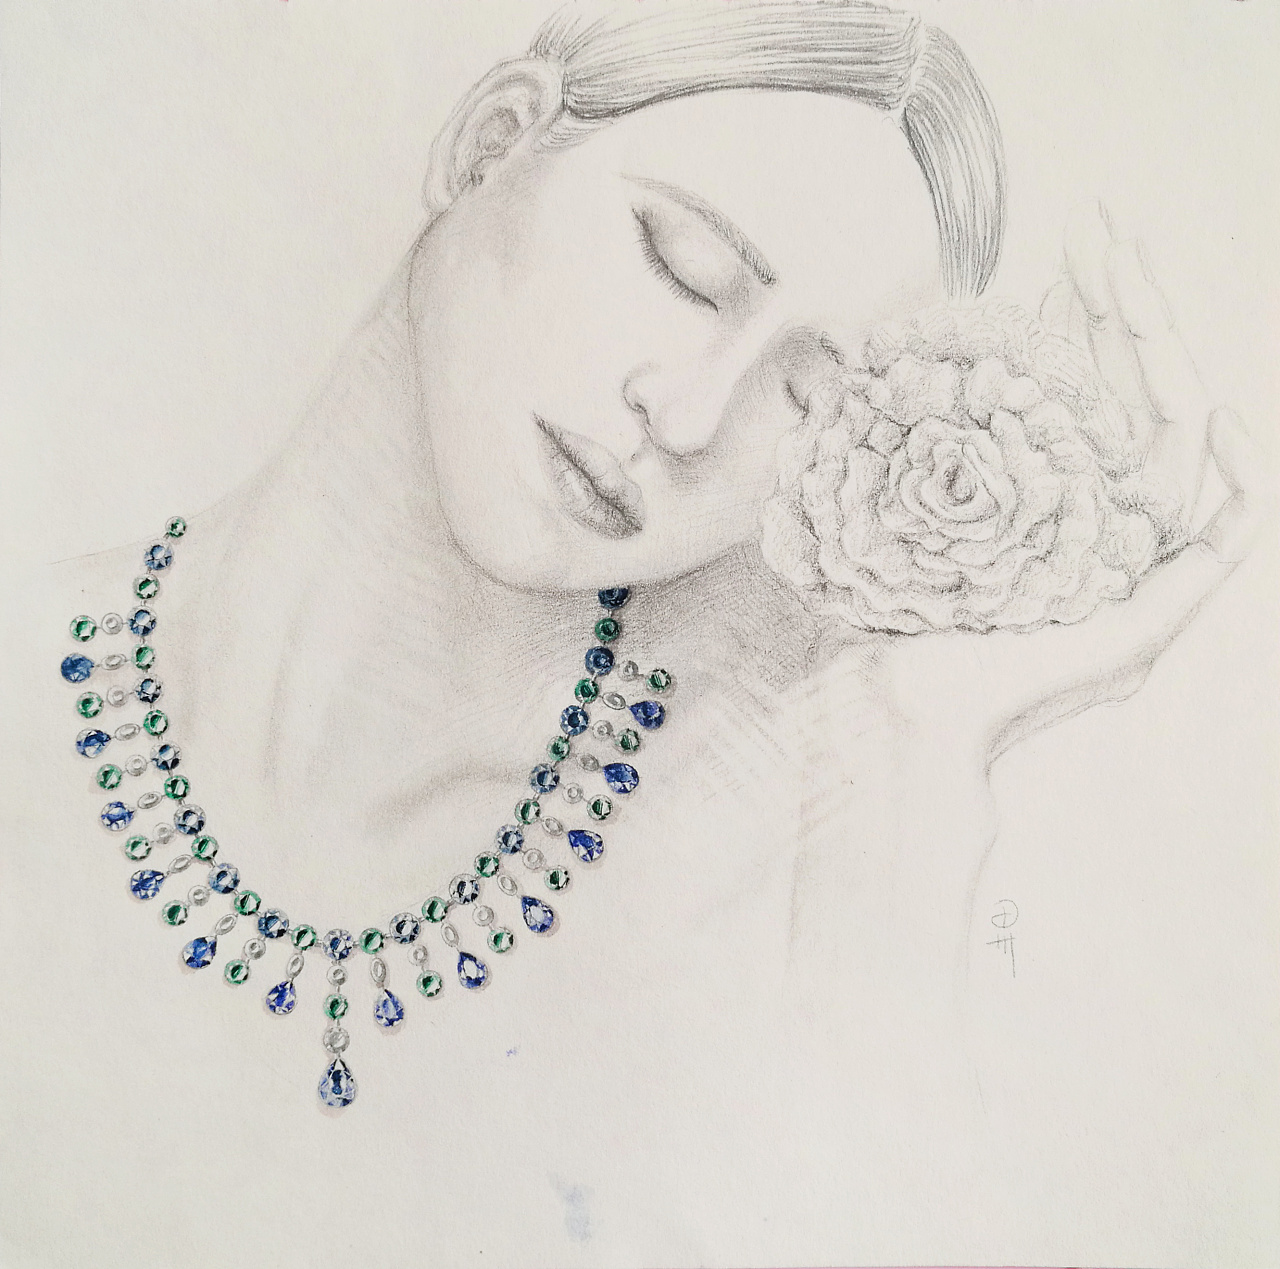 人像&珠宝手绘